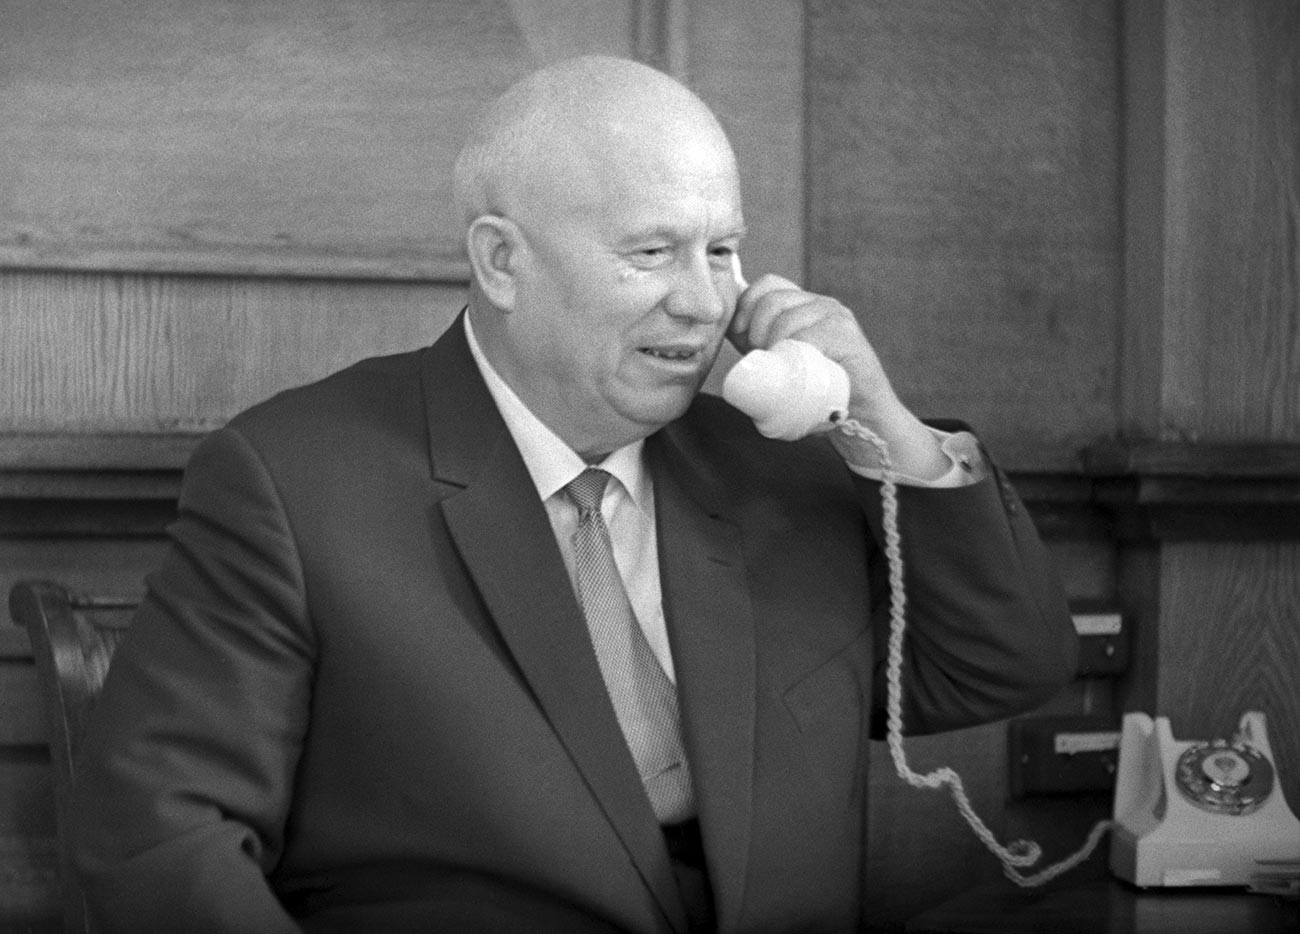 Pemimpin Uni Soviet Nikita Khrushchev di kantornya.